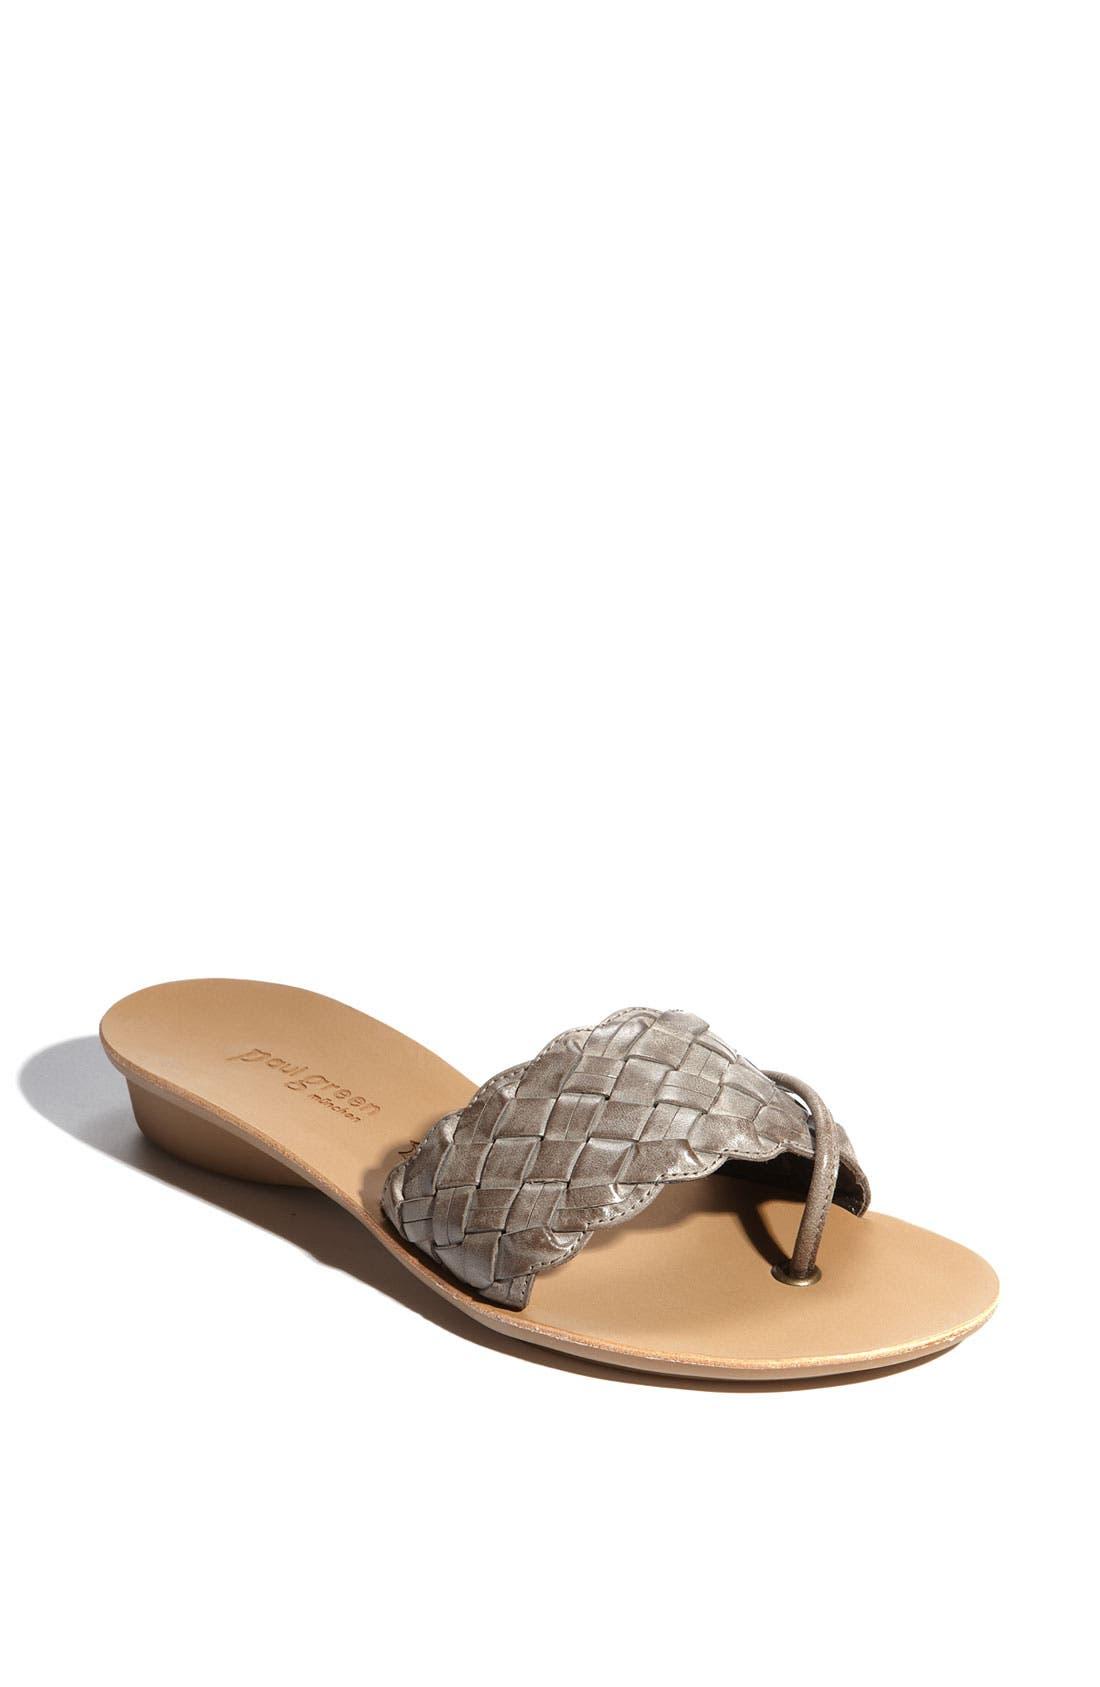 Alternate Image 1 Selected - Paul Green 'Lulu' Sandal